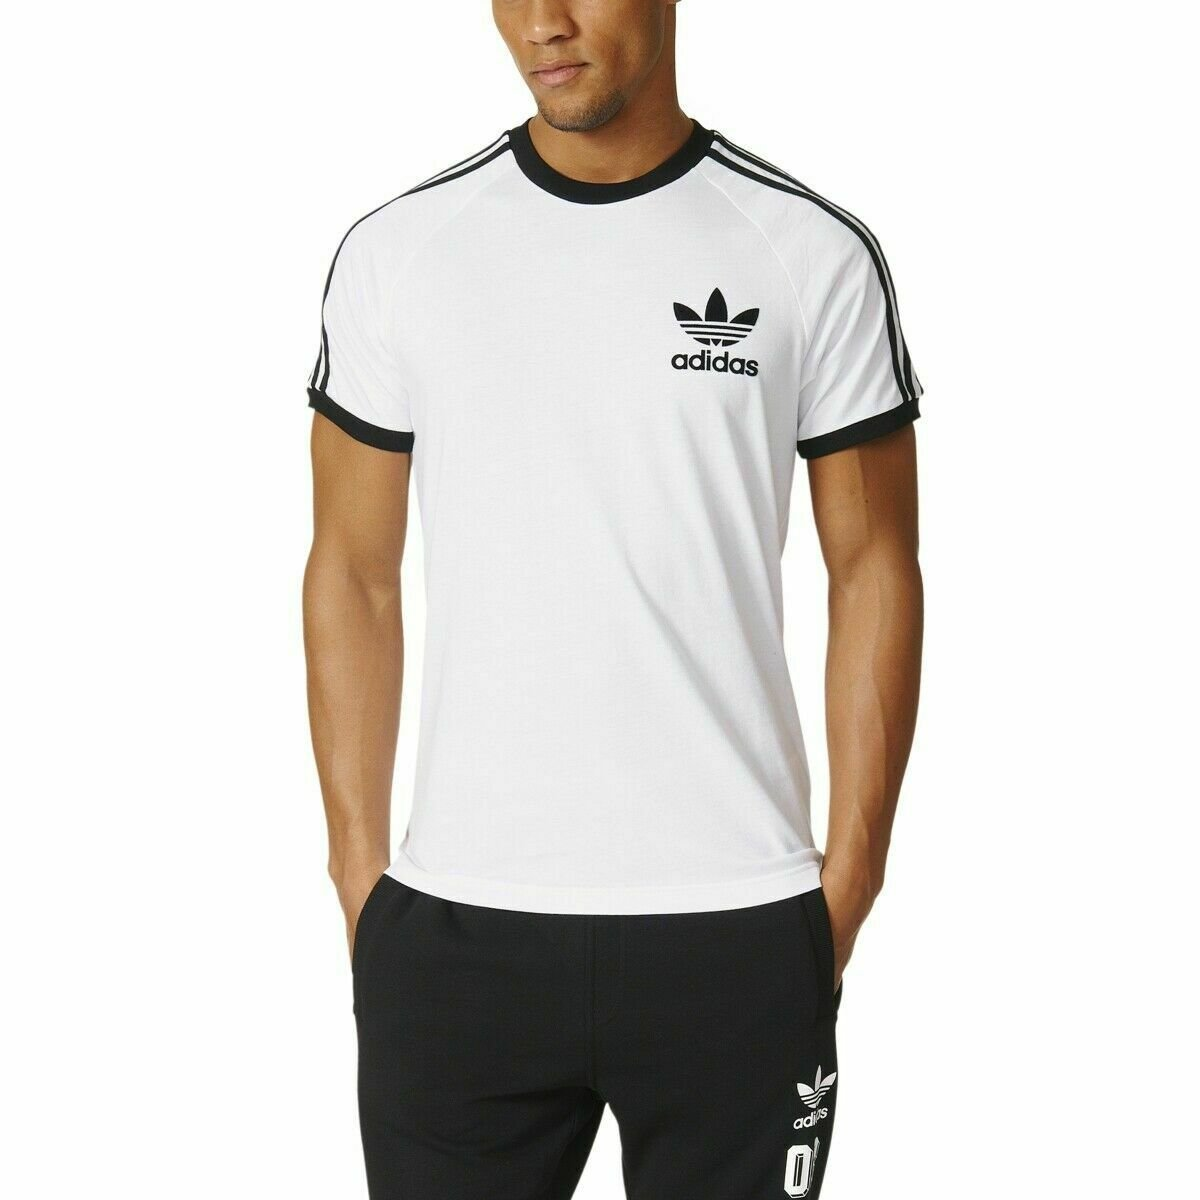 thumbnail 15 - Adidas Originals California Men's T-Shirt Trefoil Retro 3-Stripes Short Sleeve